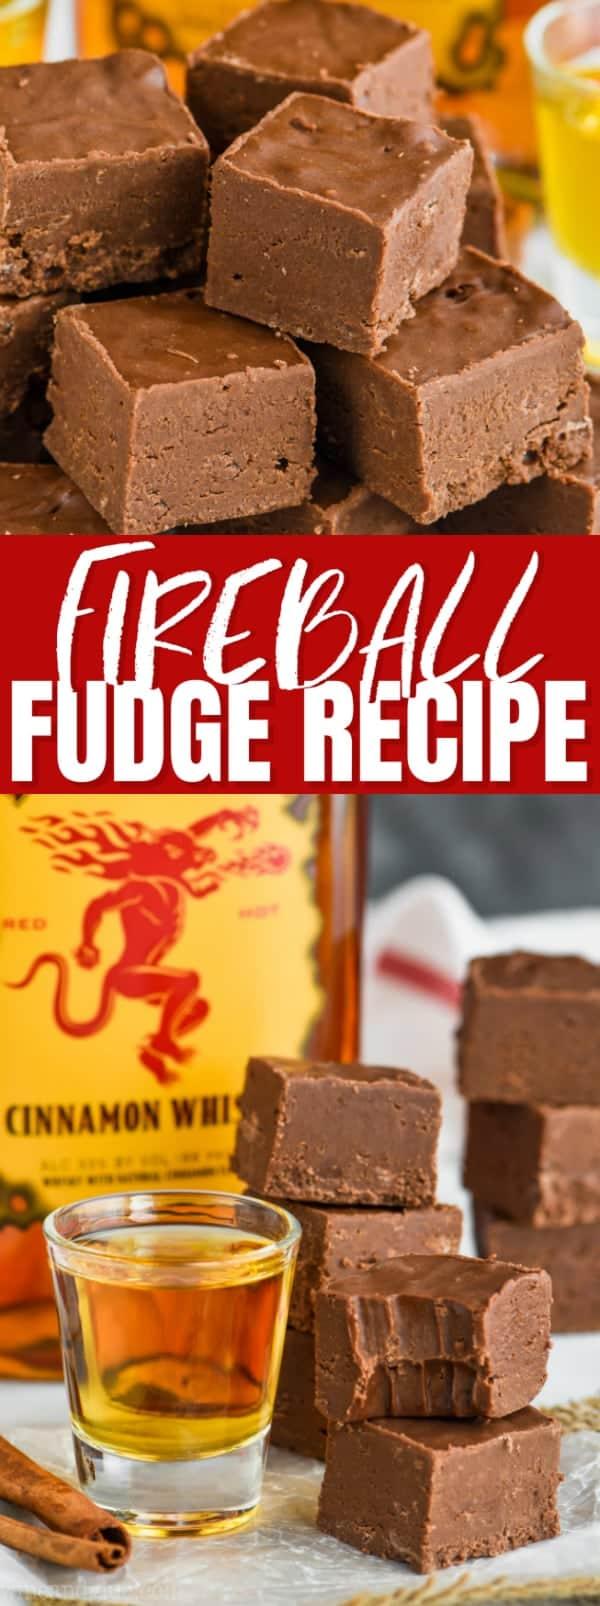 easy fireball fudge recipe, fudge made with whiskey